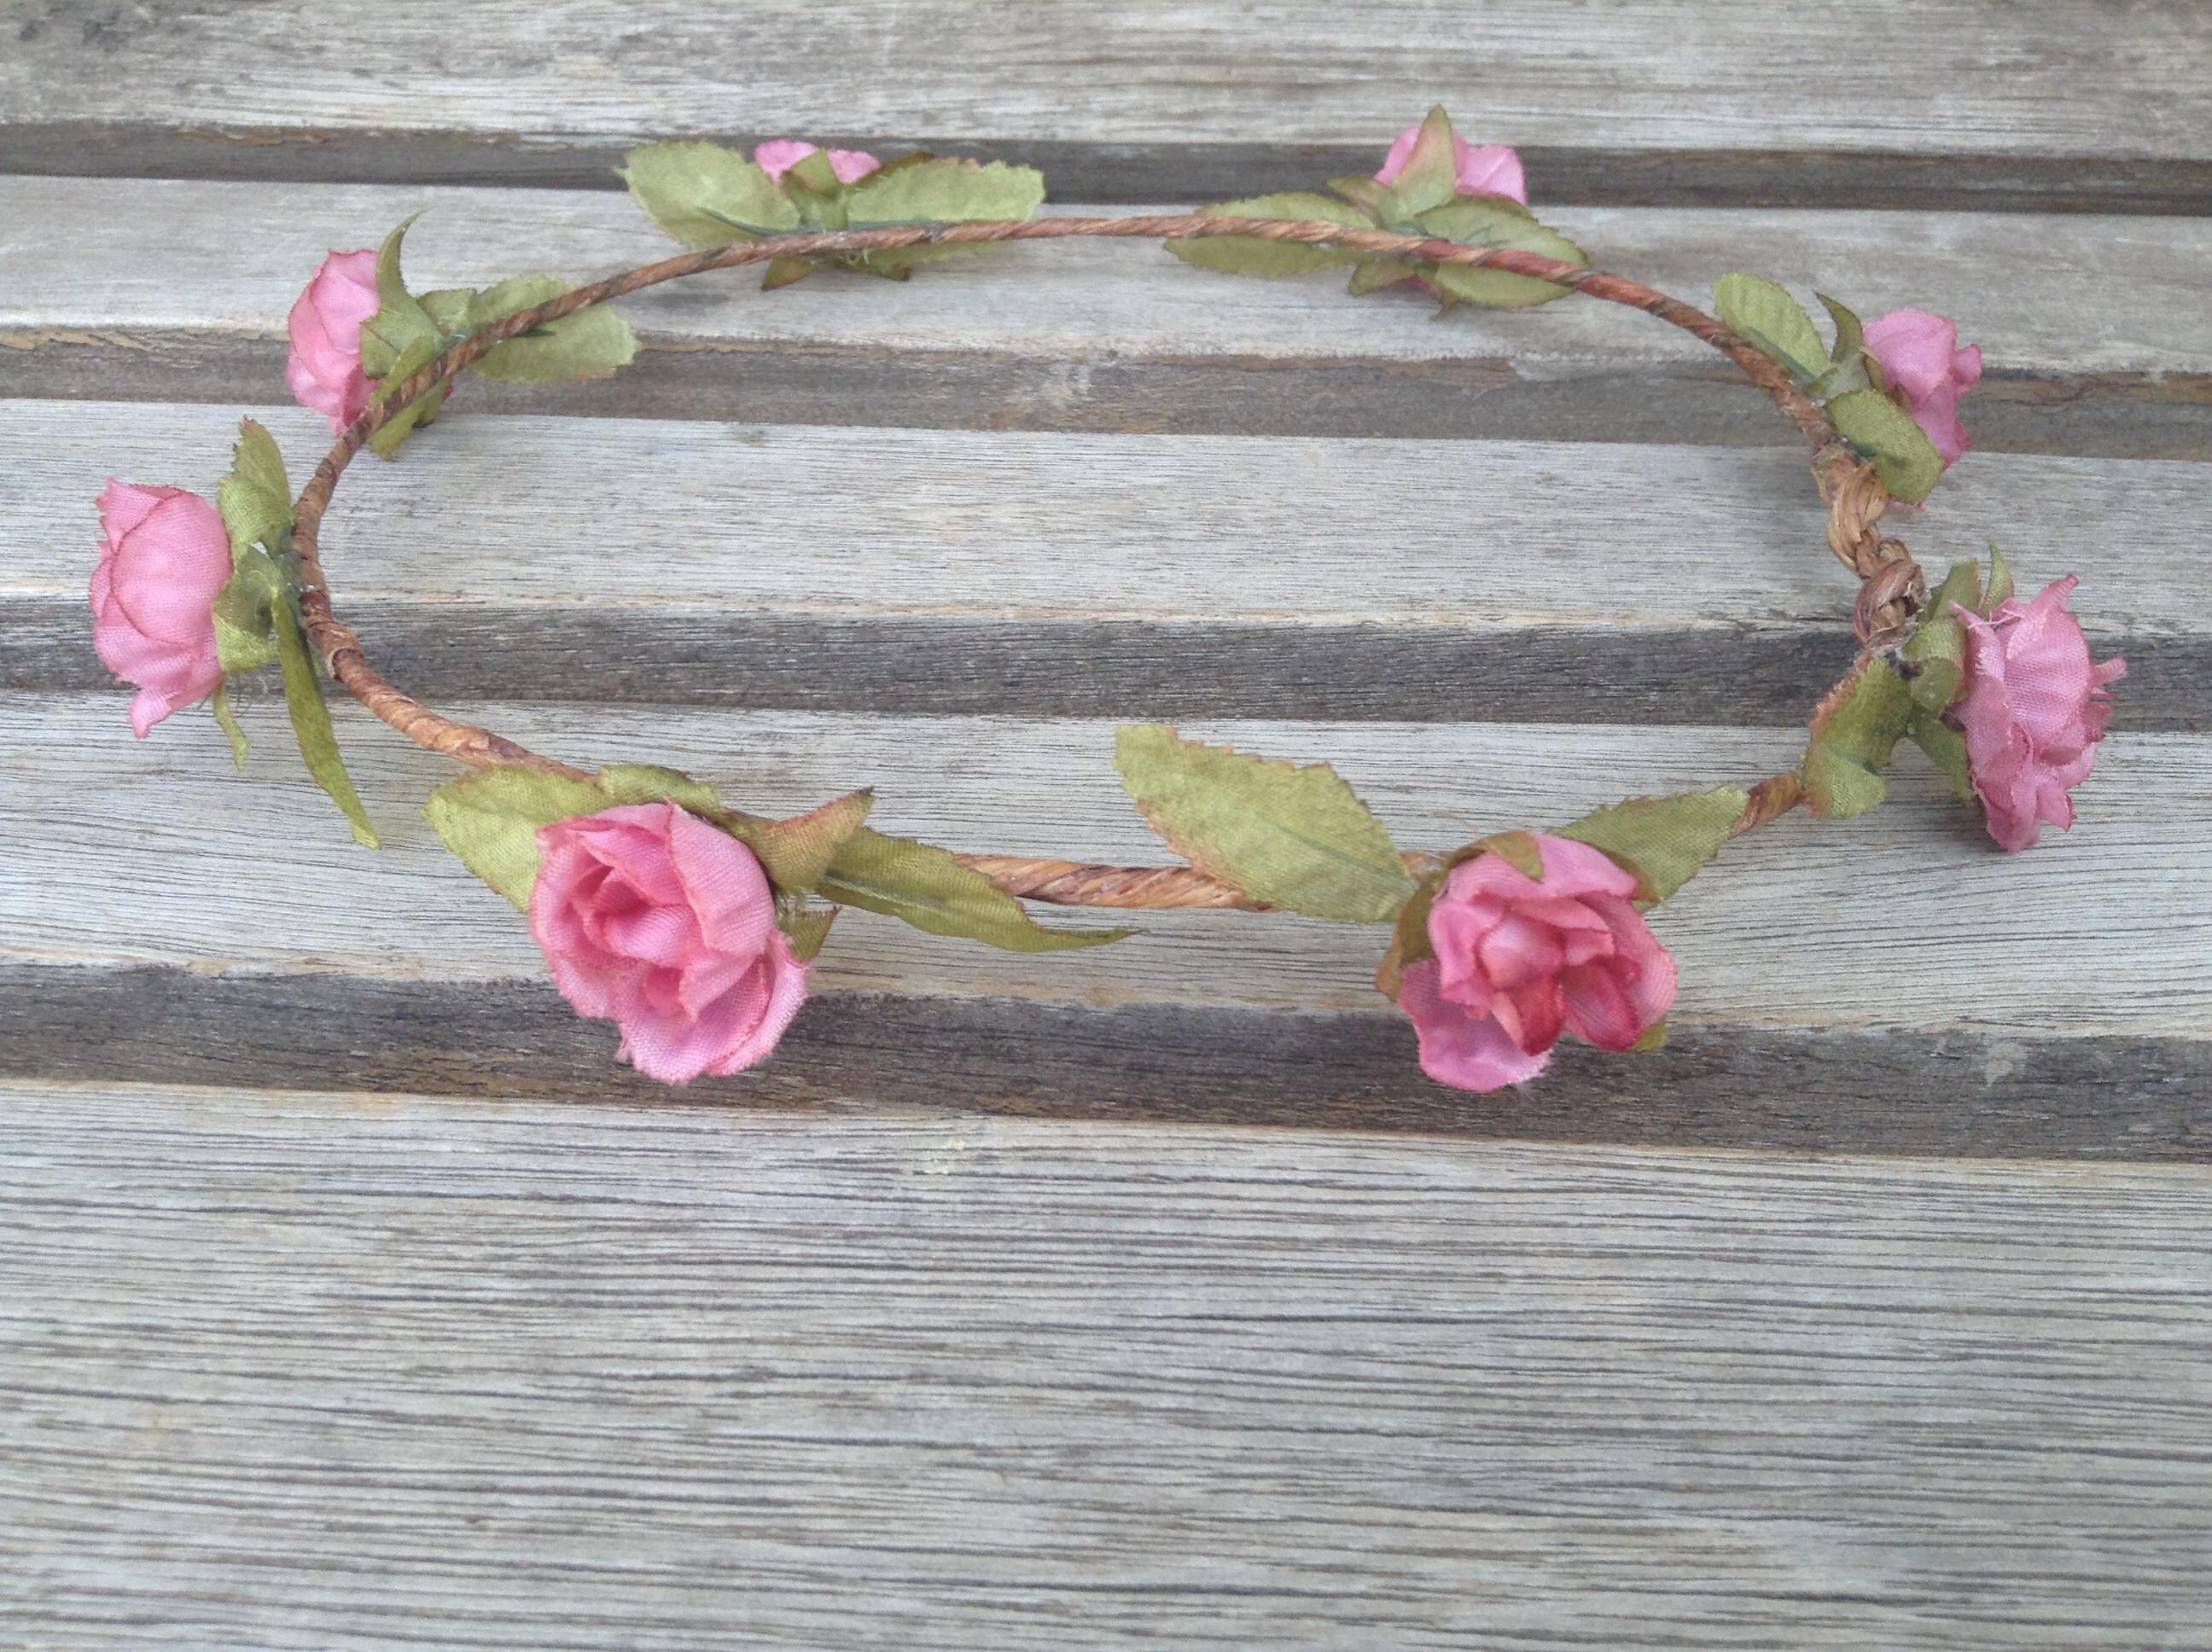 Rapunzel flower crown on storenvy image original izmirmasajfo